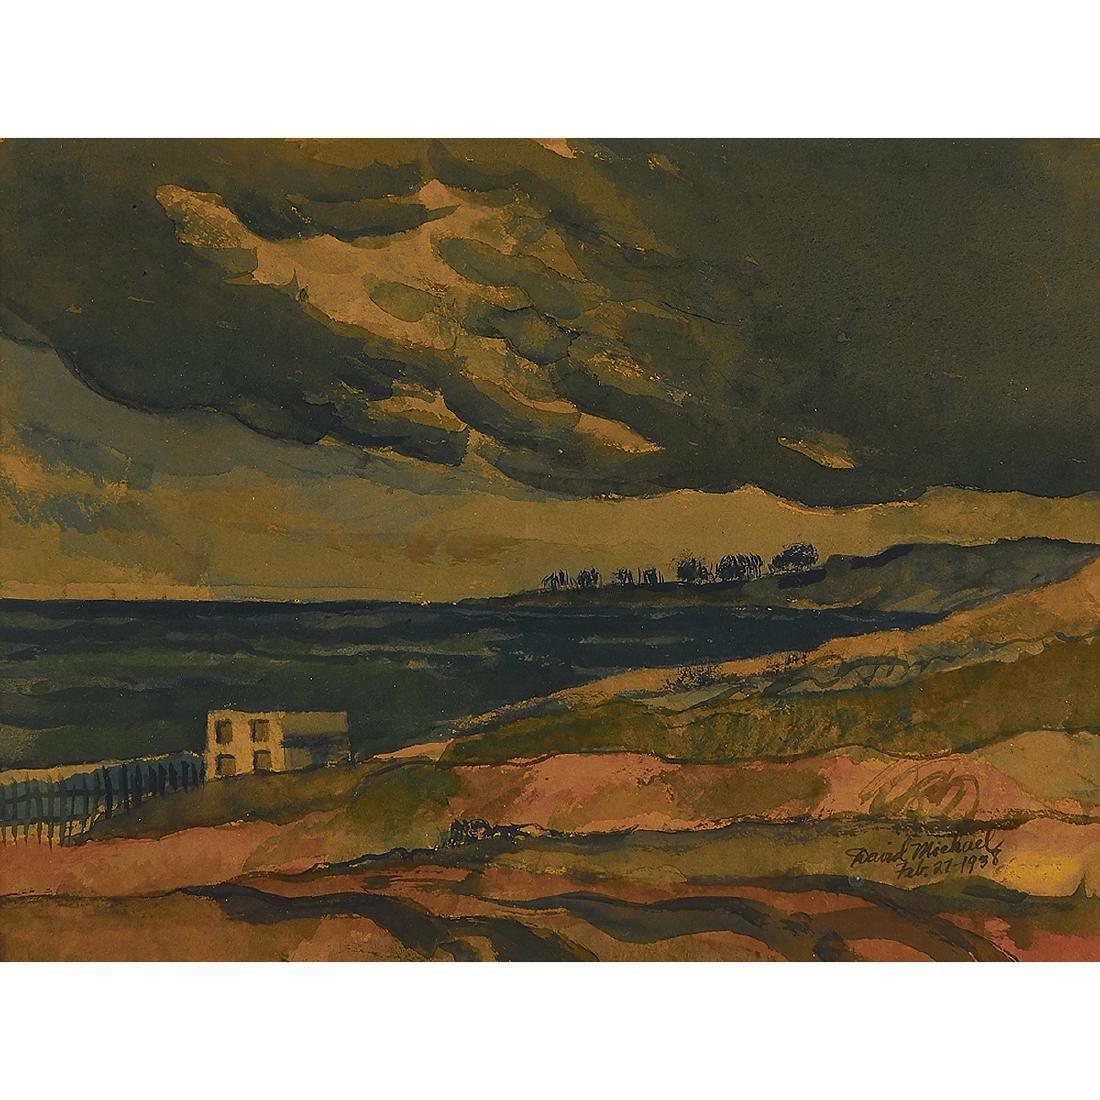 David Michael, Landscape, 1938